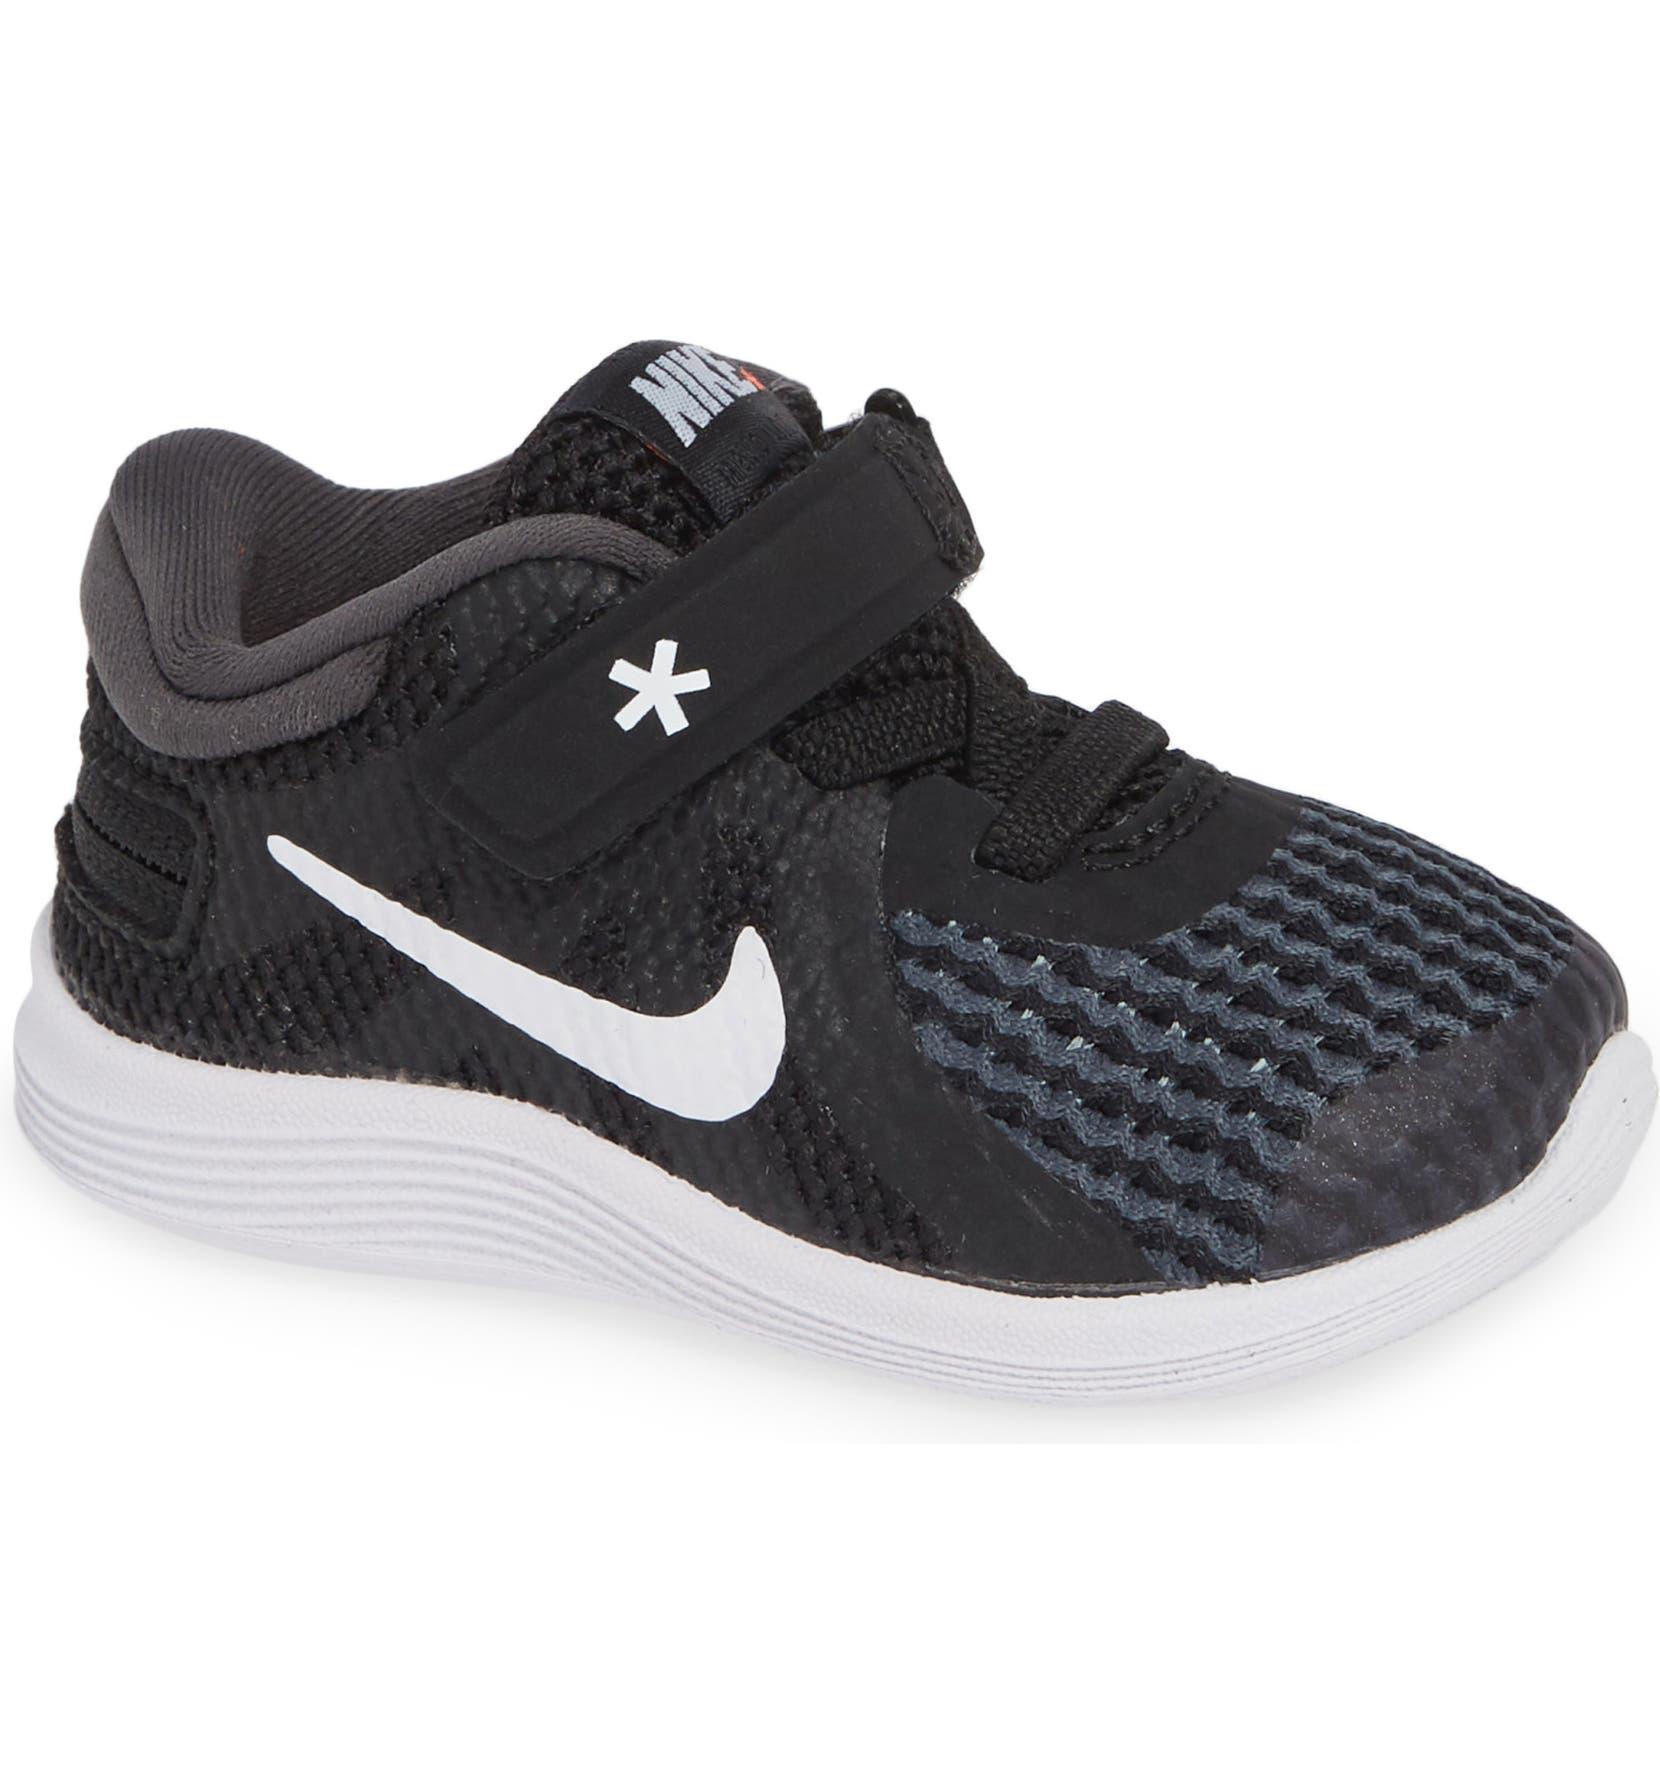 5854dc7d310 Nike Revolution 4 Flyease Sneaker (Baby